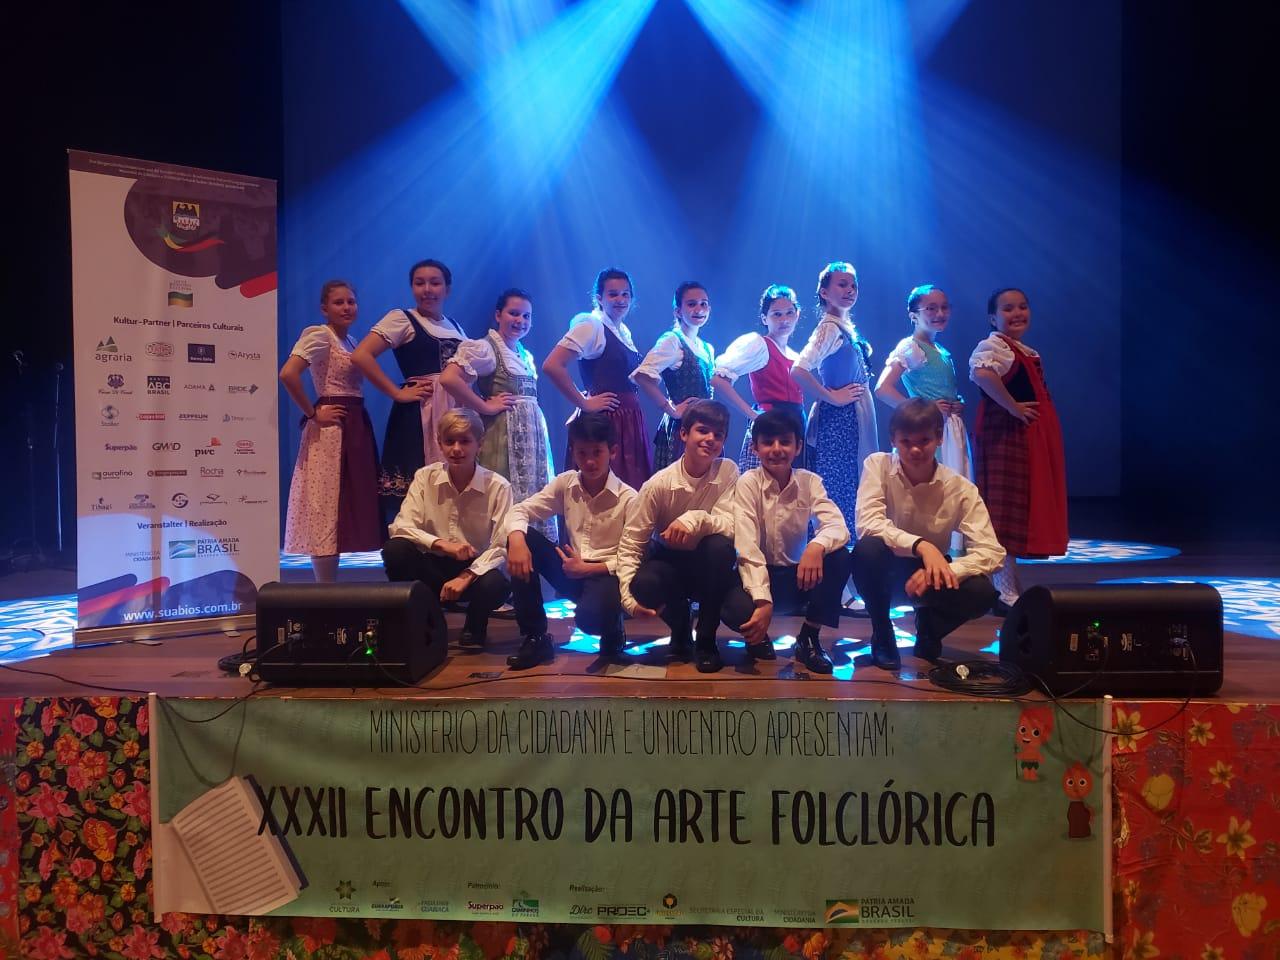 Grupo Folclórico Juvenil da FCSB no XXXII Encontro da Arte Folclórica - 21/08/2019Grupo Folclórico Juvenil da FCSB no XXXII Encontro da Arte Folclórica - 21/08/2019